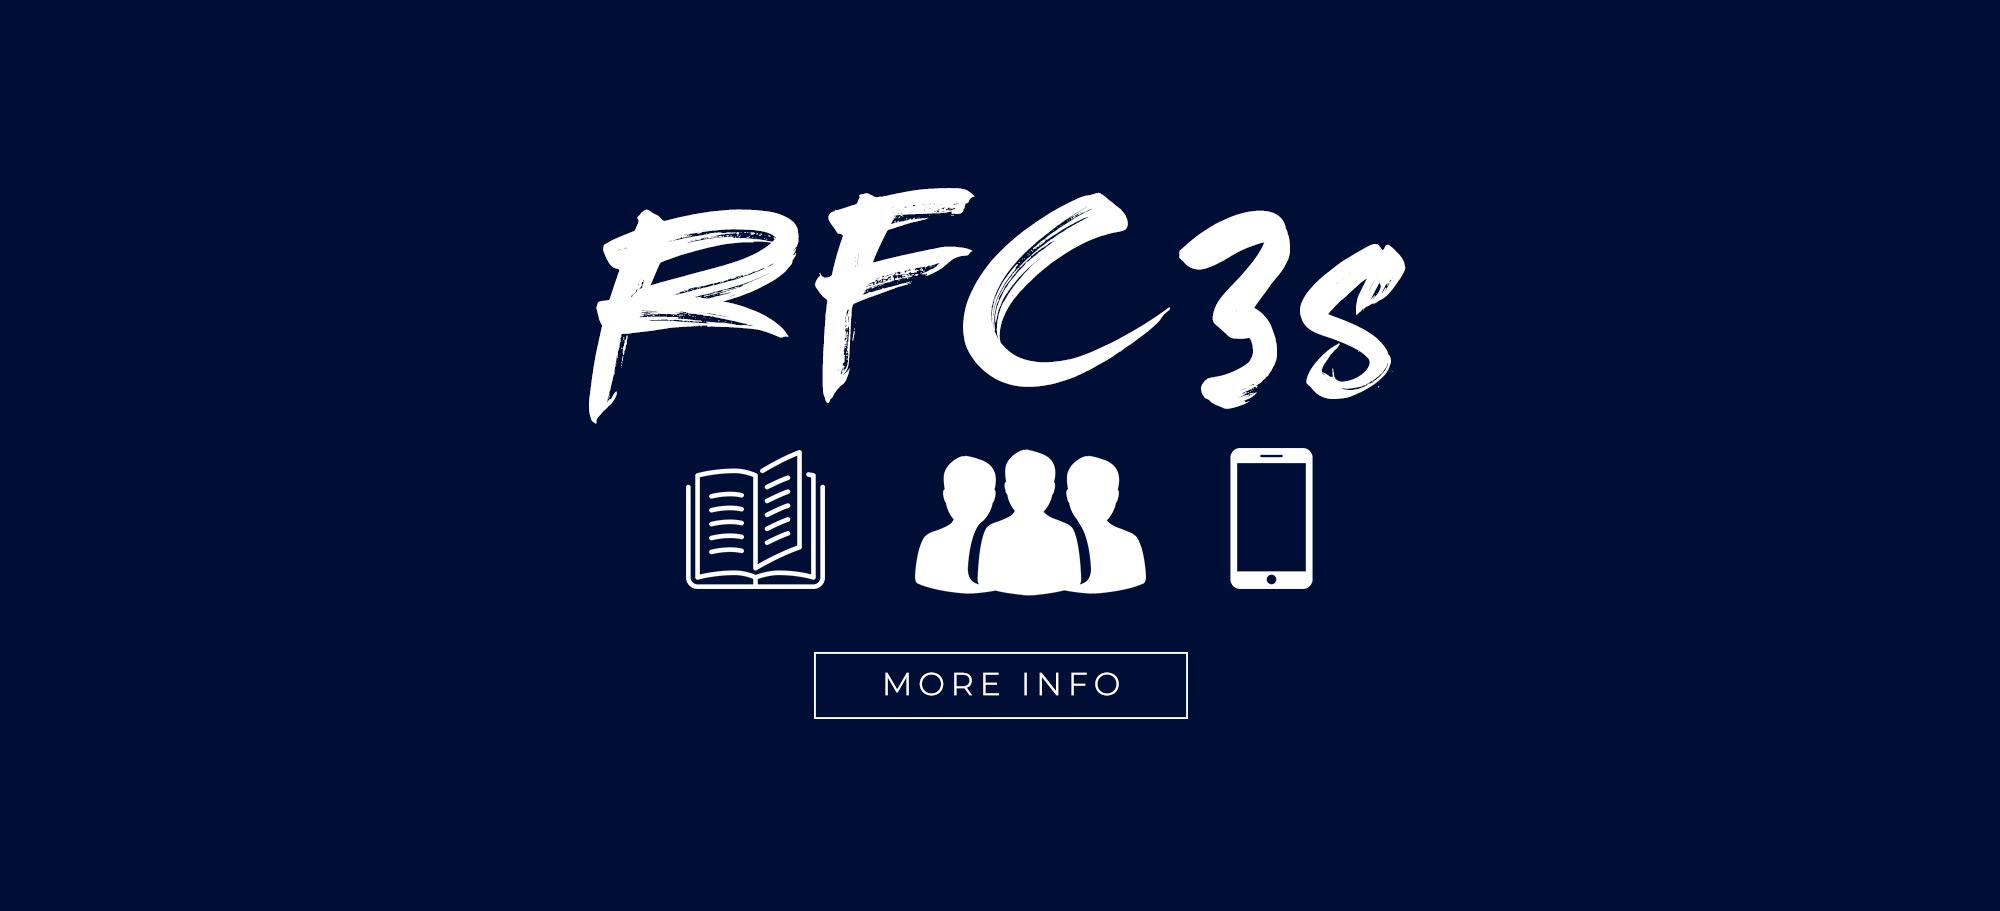 RFC 3s